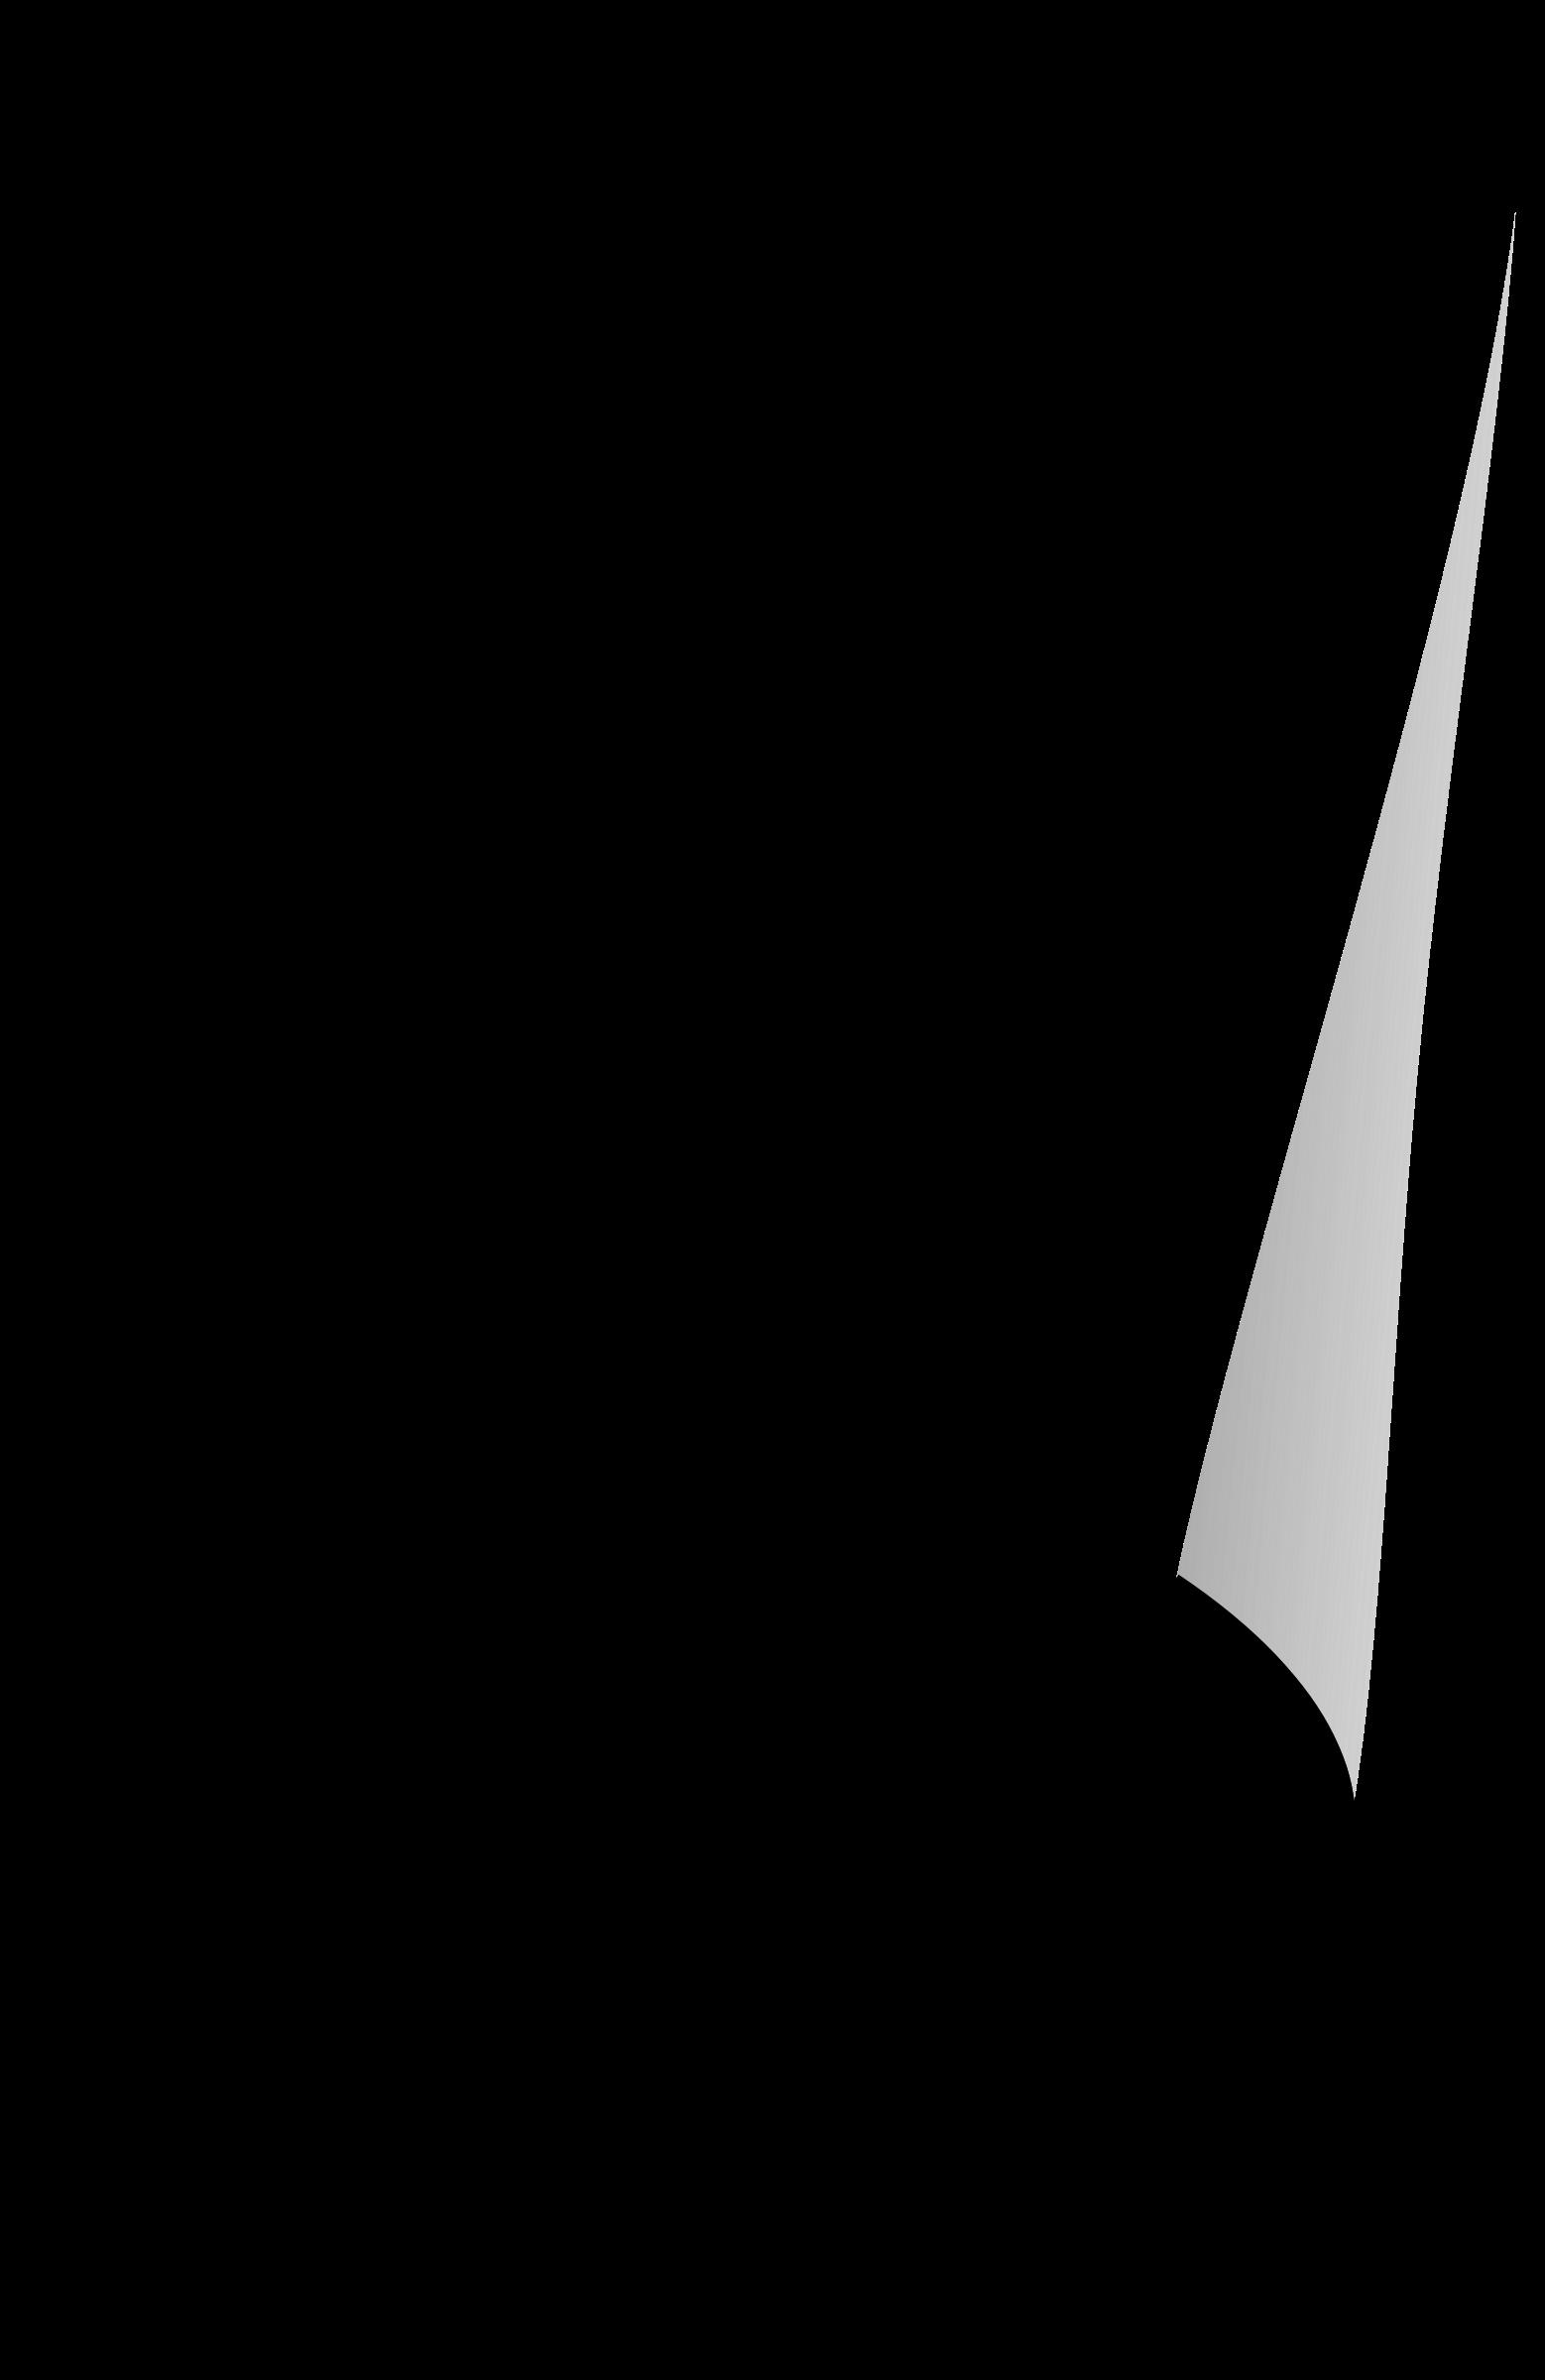 nose clip art nase png 1558 2400 iddi skool pinterest rh pinterest co uk nose clipart png nose clip art free